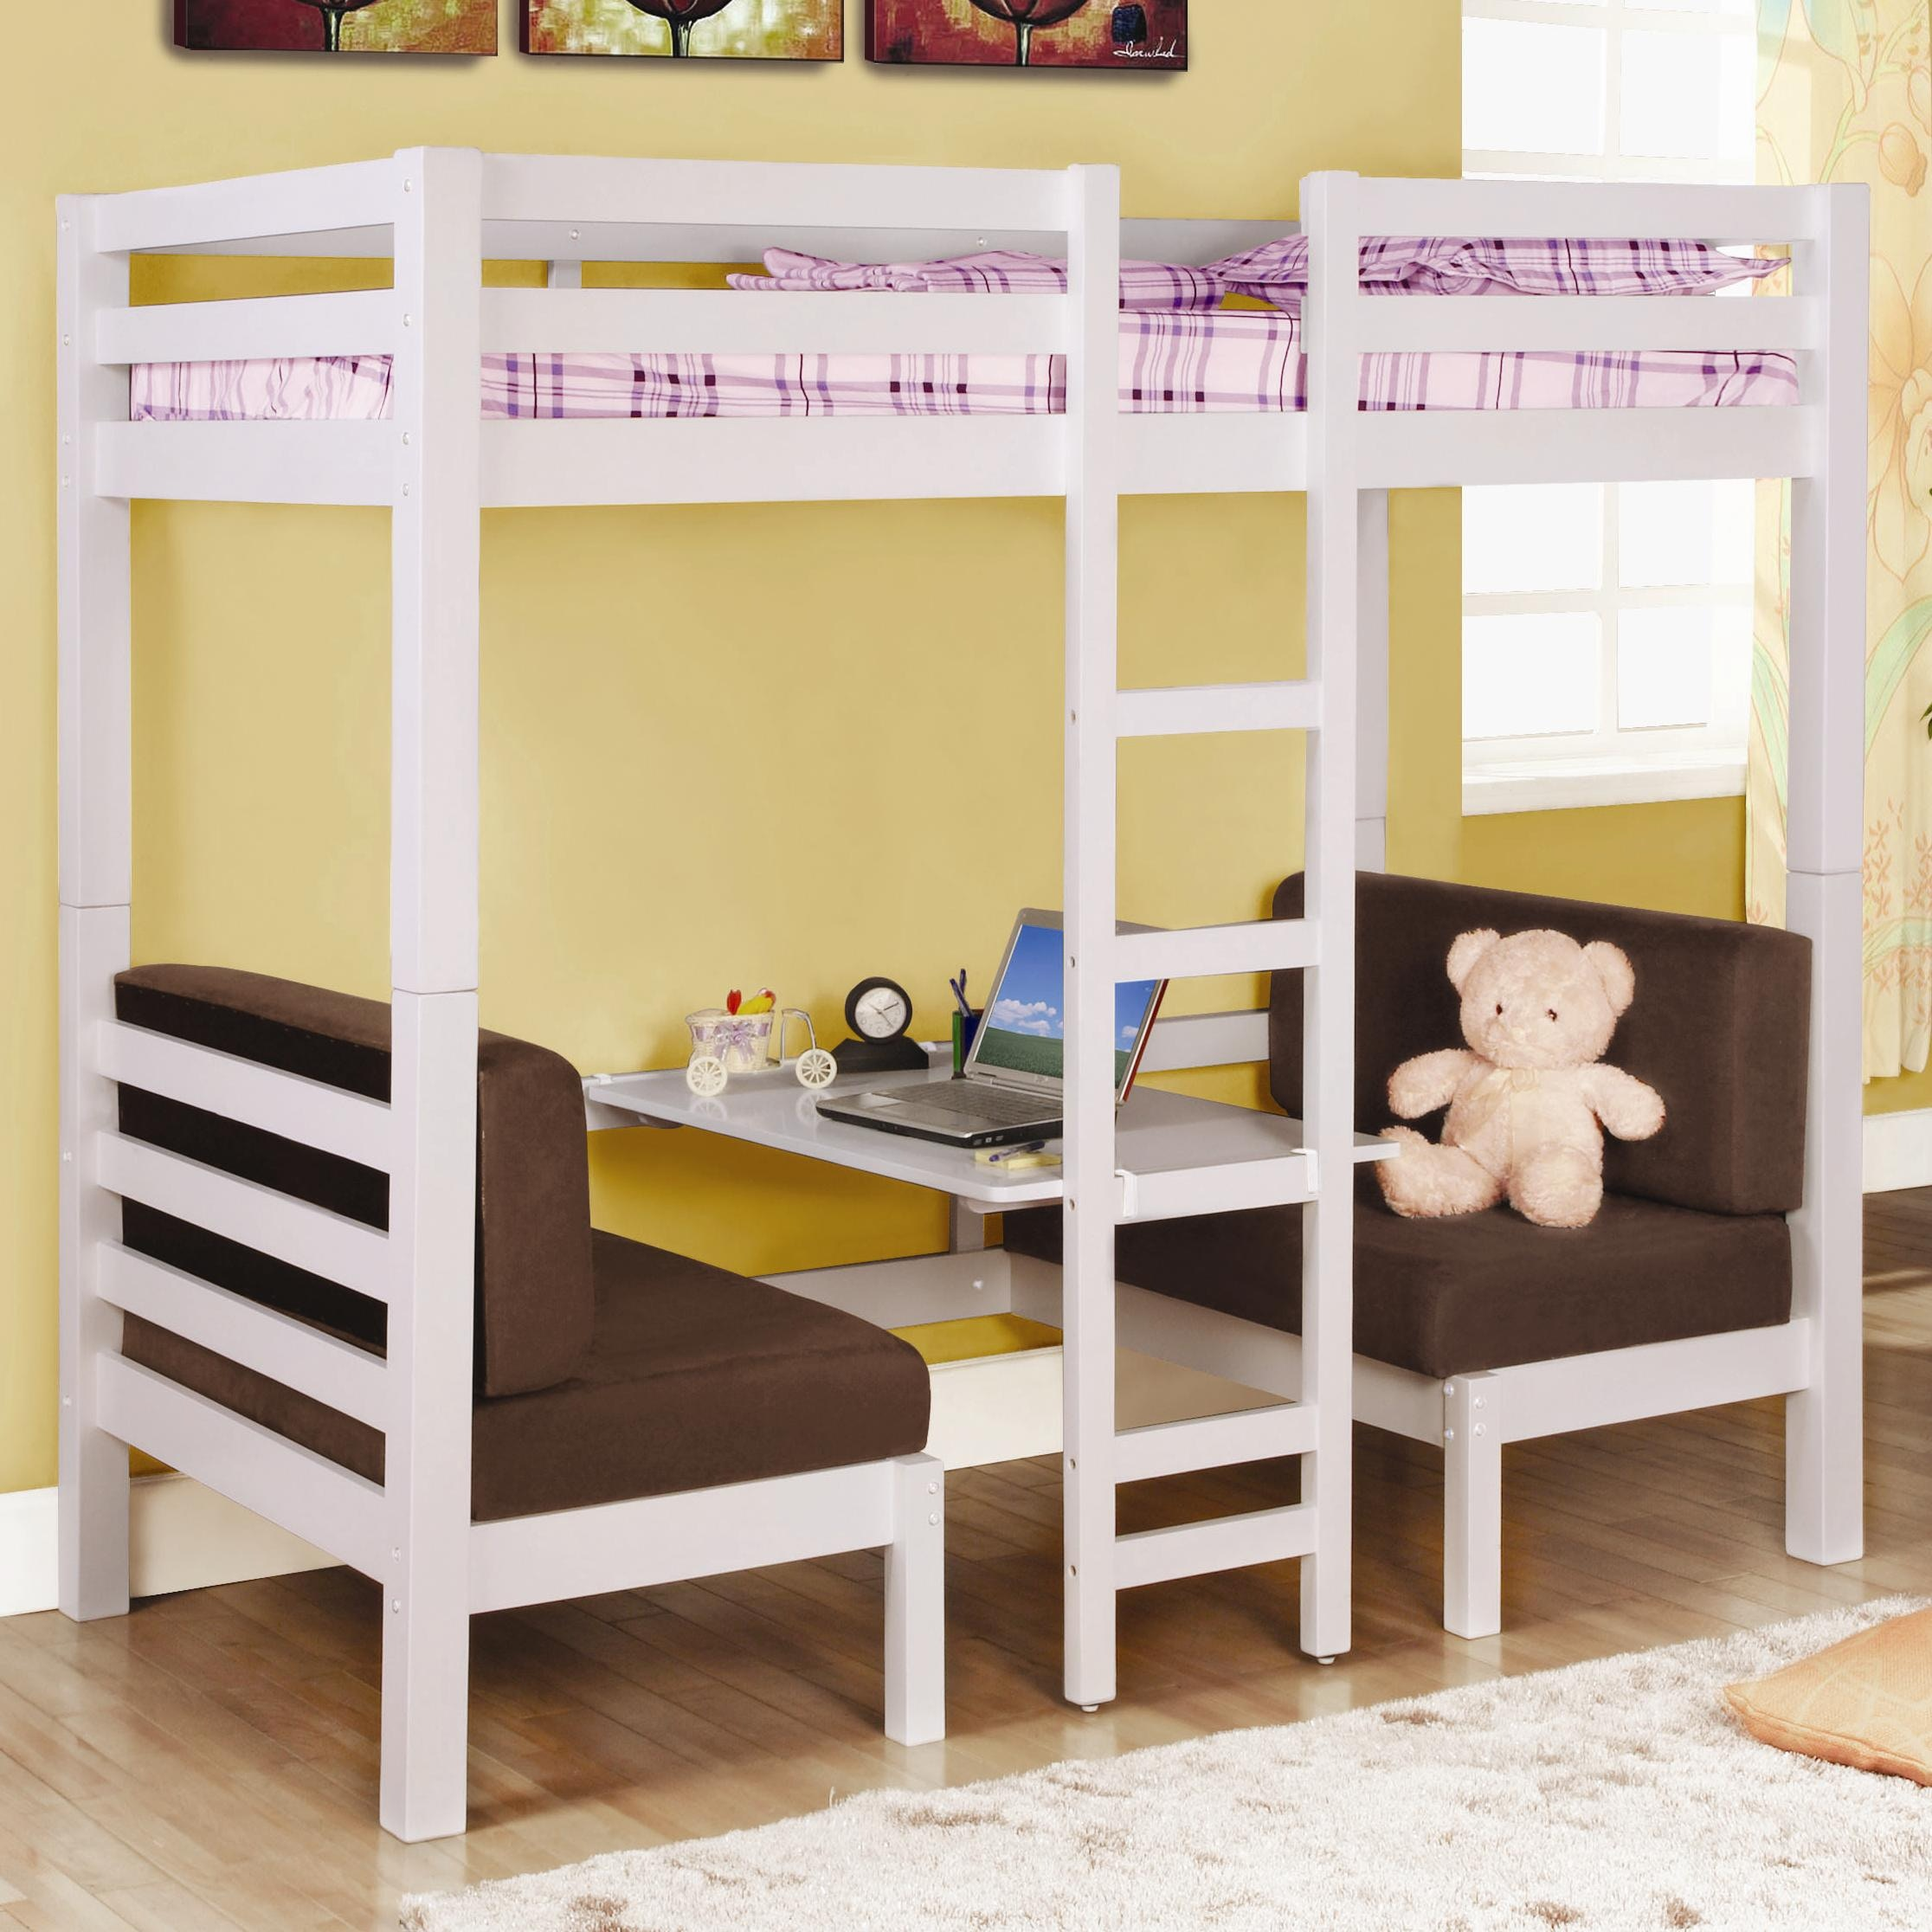 furniture quality furniture everyone can afford ikea